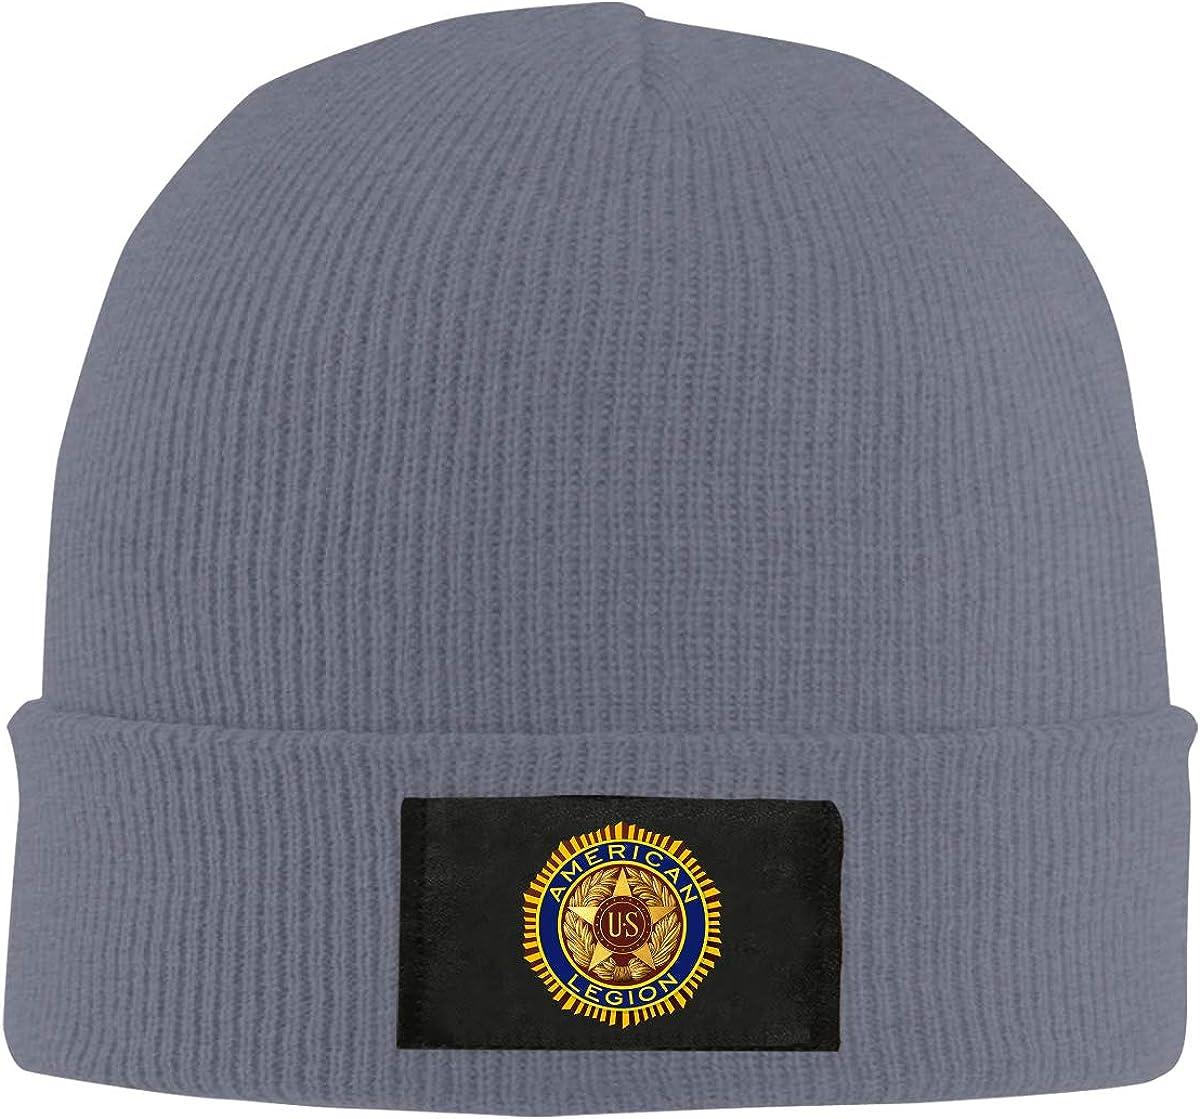 American Legion Unisex Warm Winter Hat Knit Beanie Skull Cap Cuff Beanie Hat Winter Hats